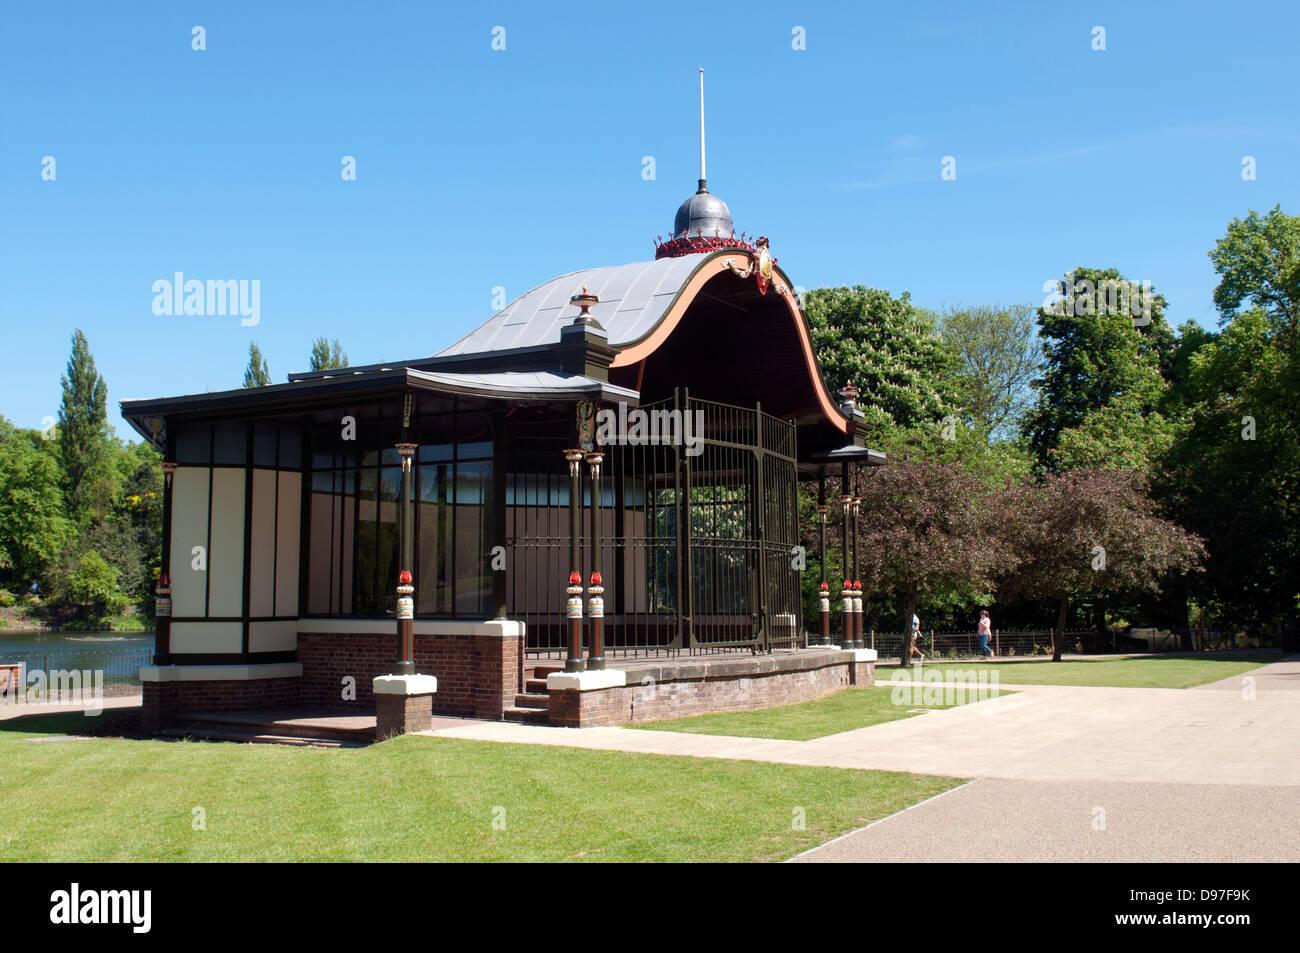 The bandstand, Walsall Arboretum, West Midlands, England, United Kingdom - Stock Image